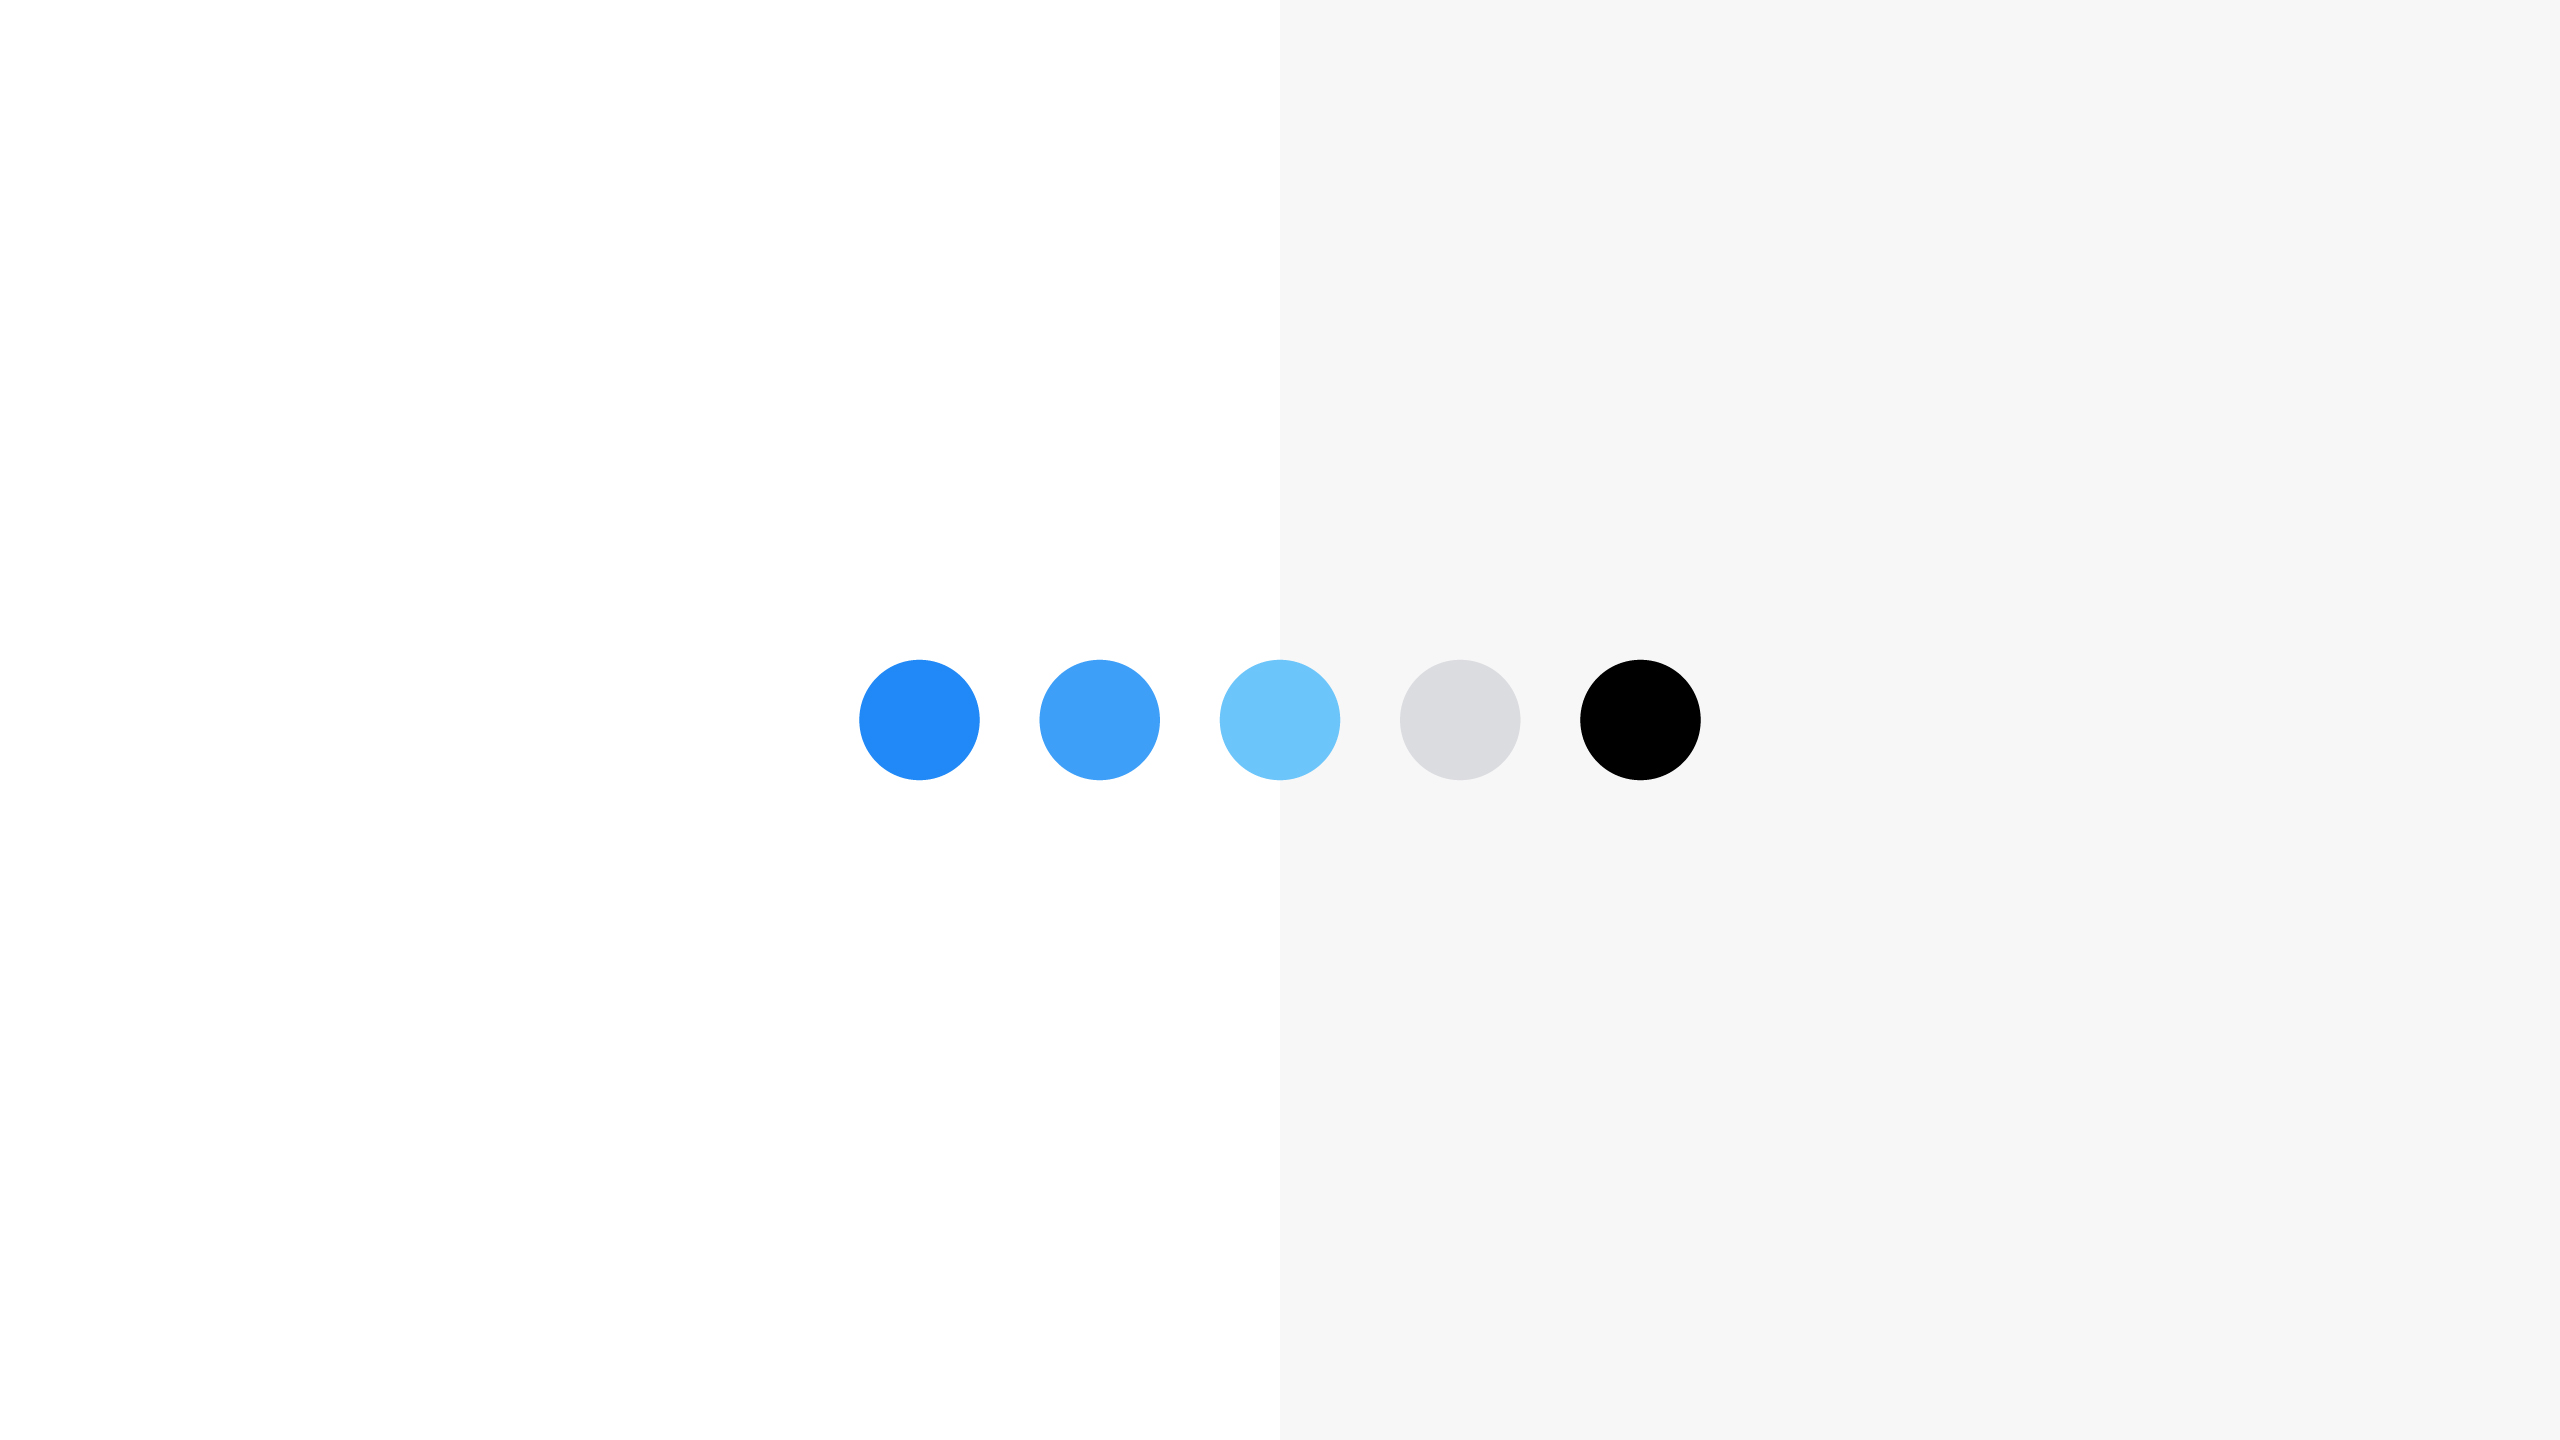 Inspirado por iOS7